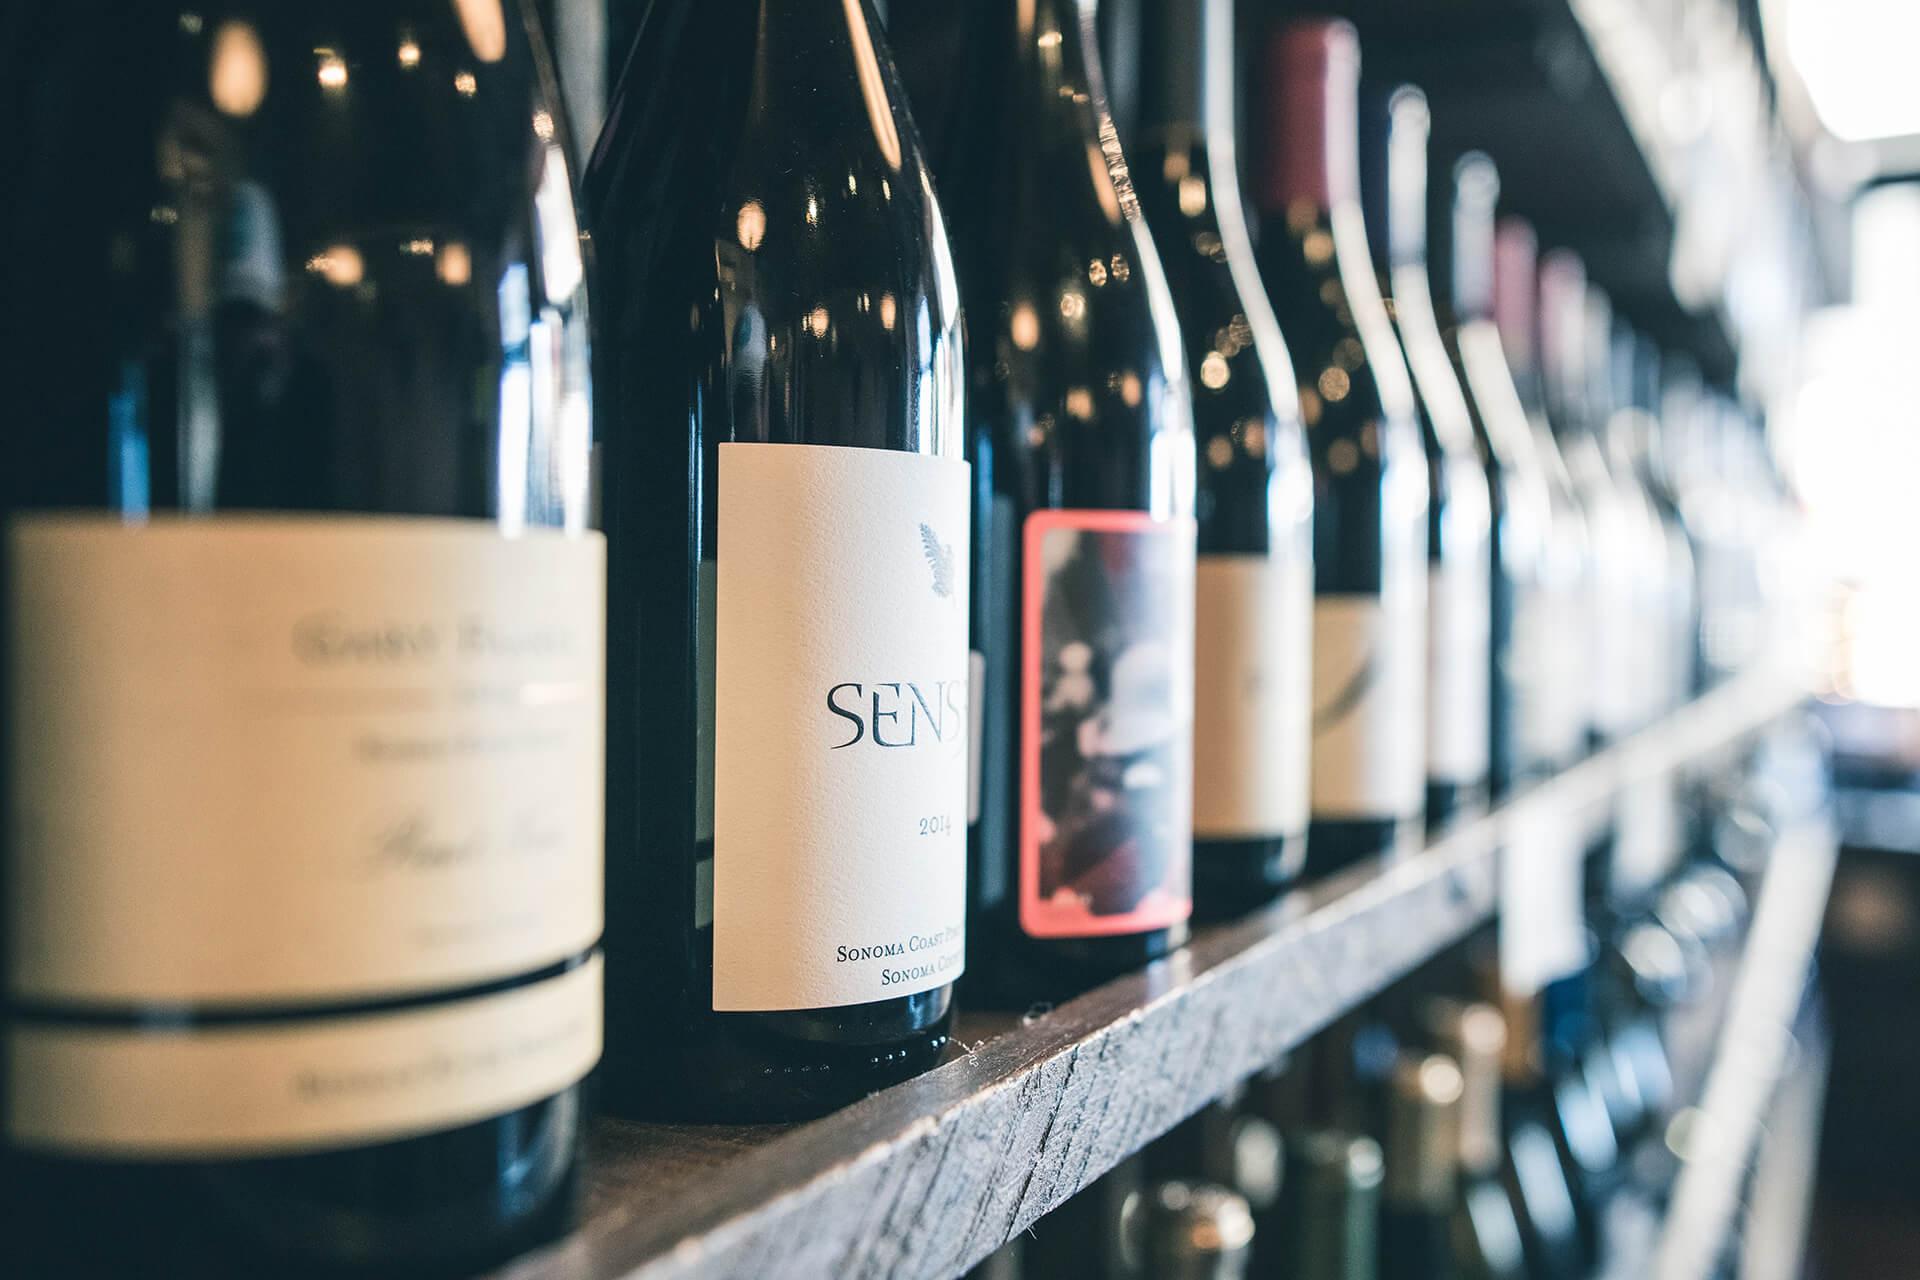 Wijn Arnhem